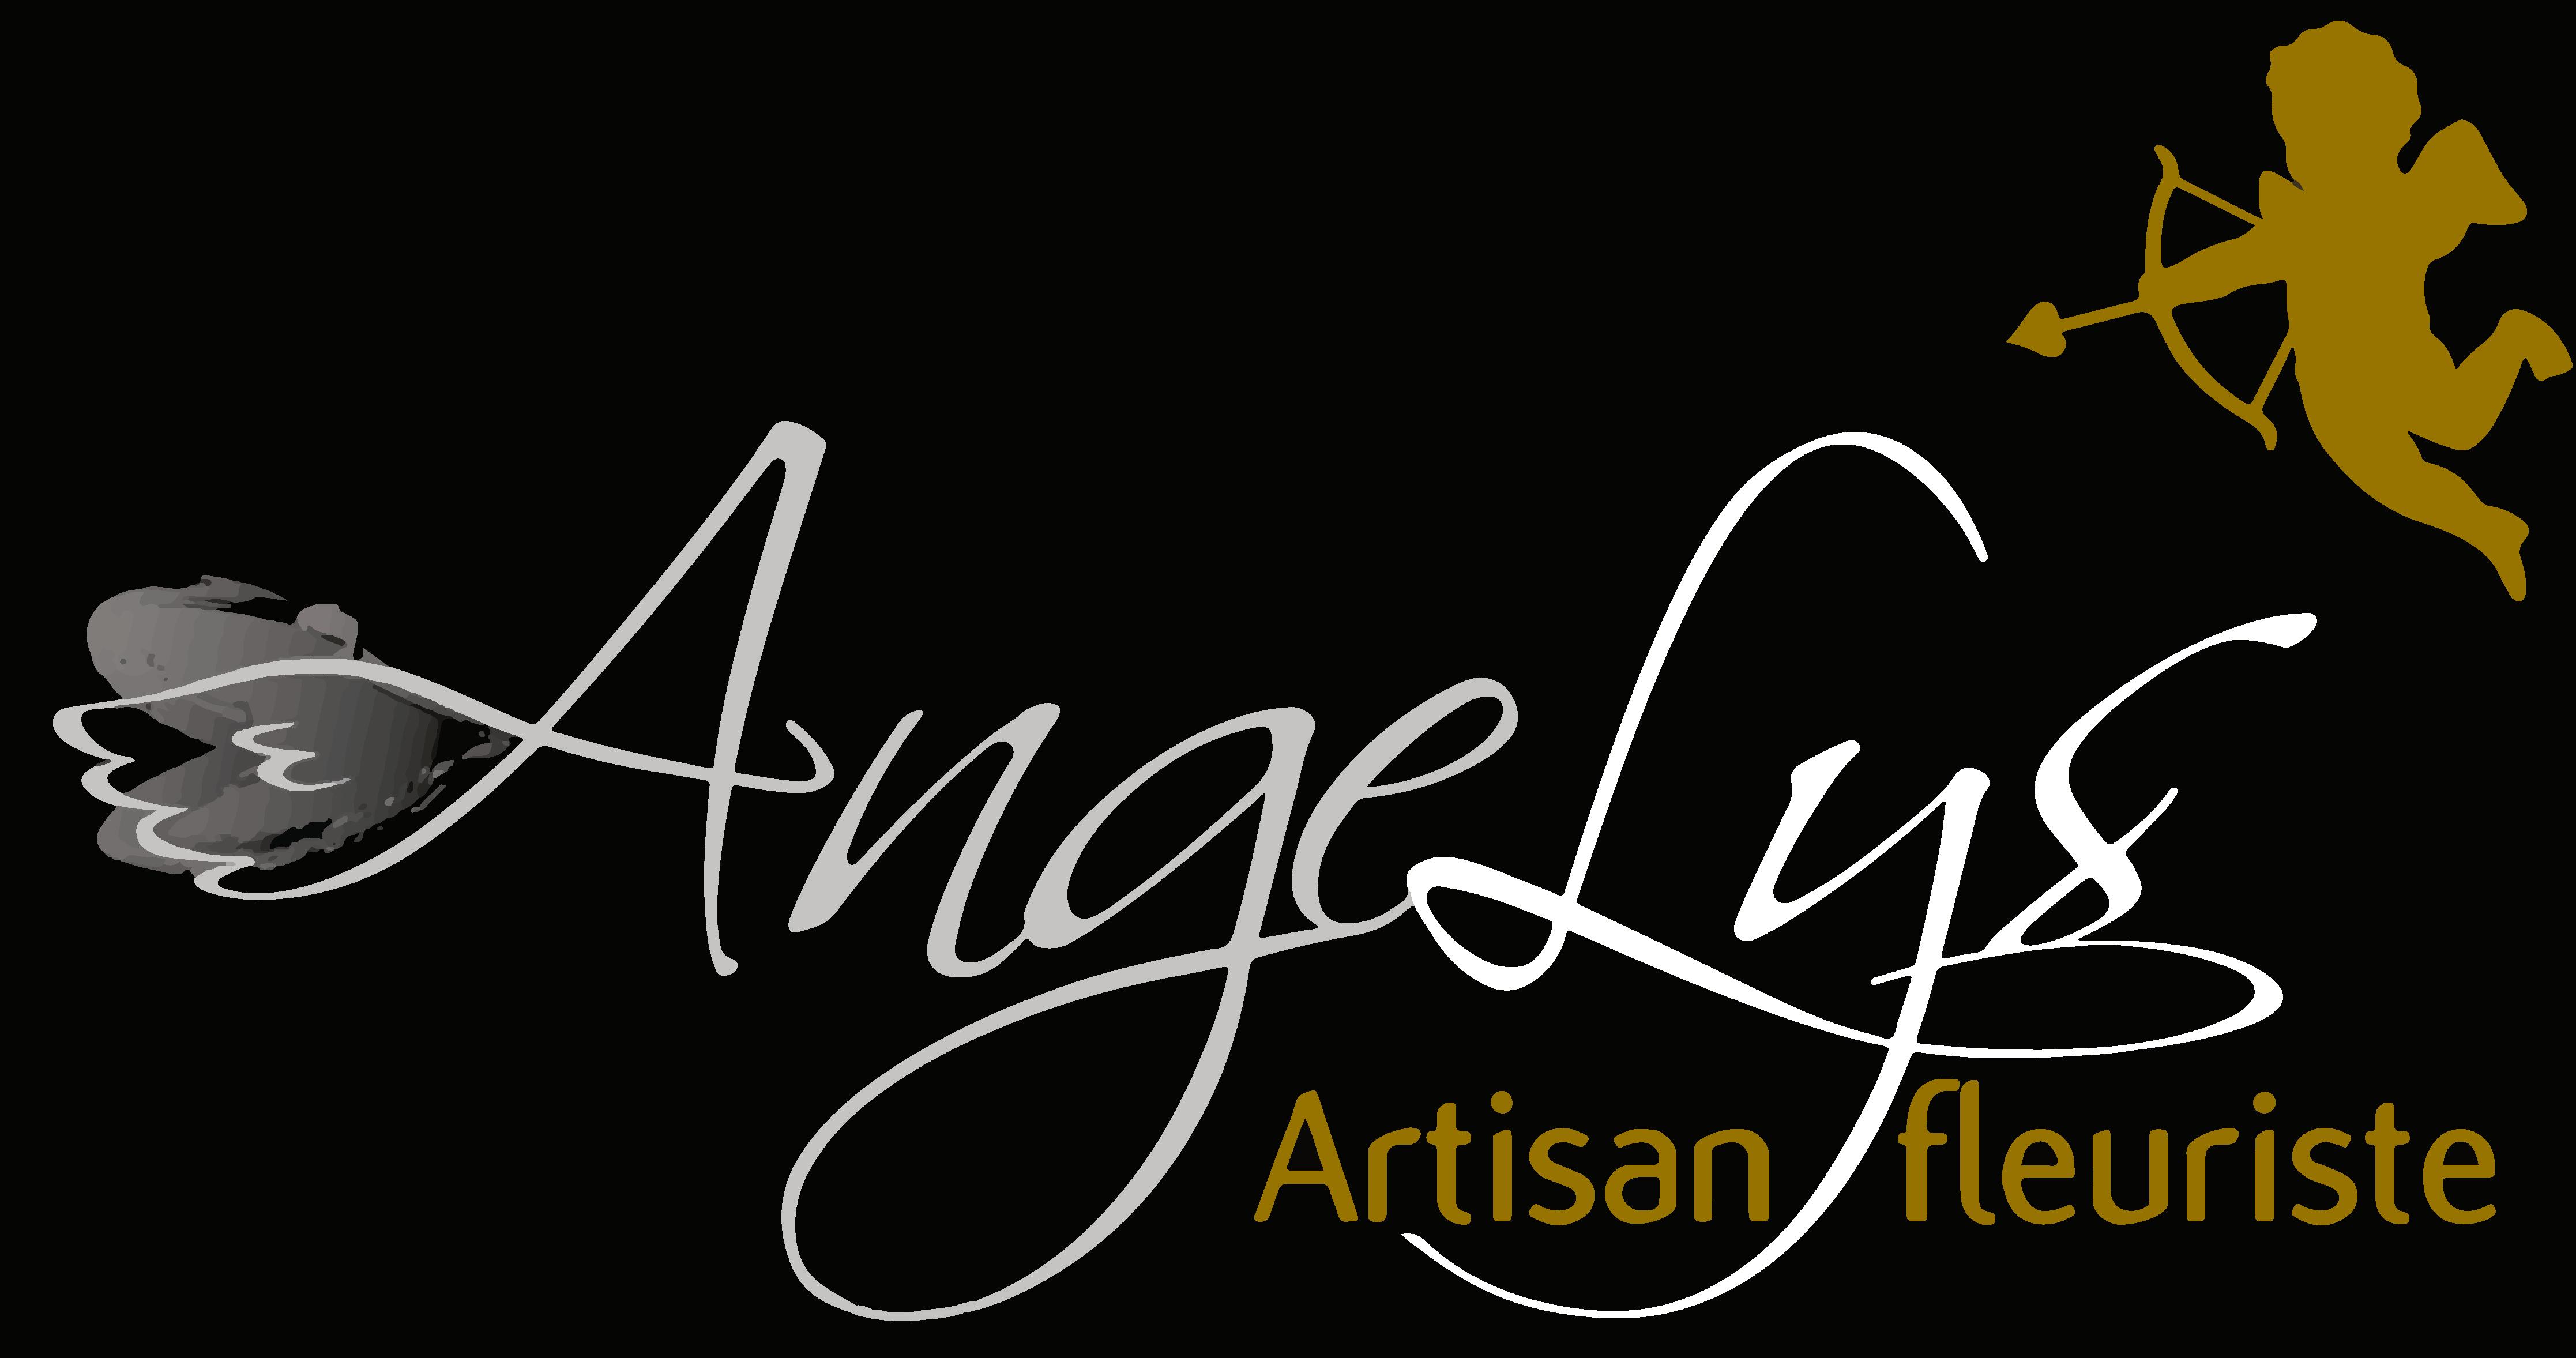 AngeLys | Artisan fleuriste